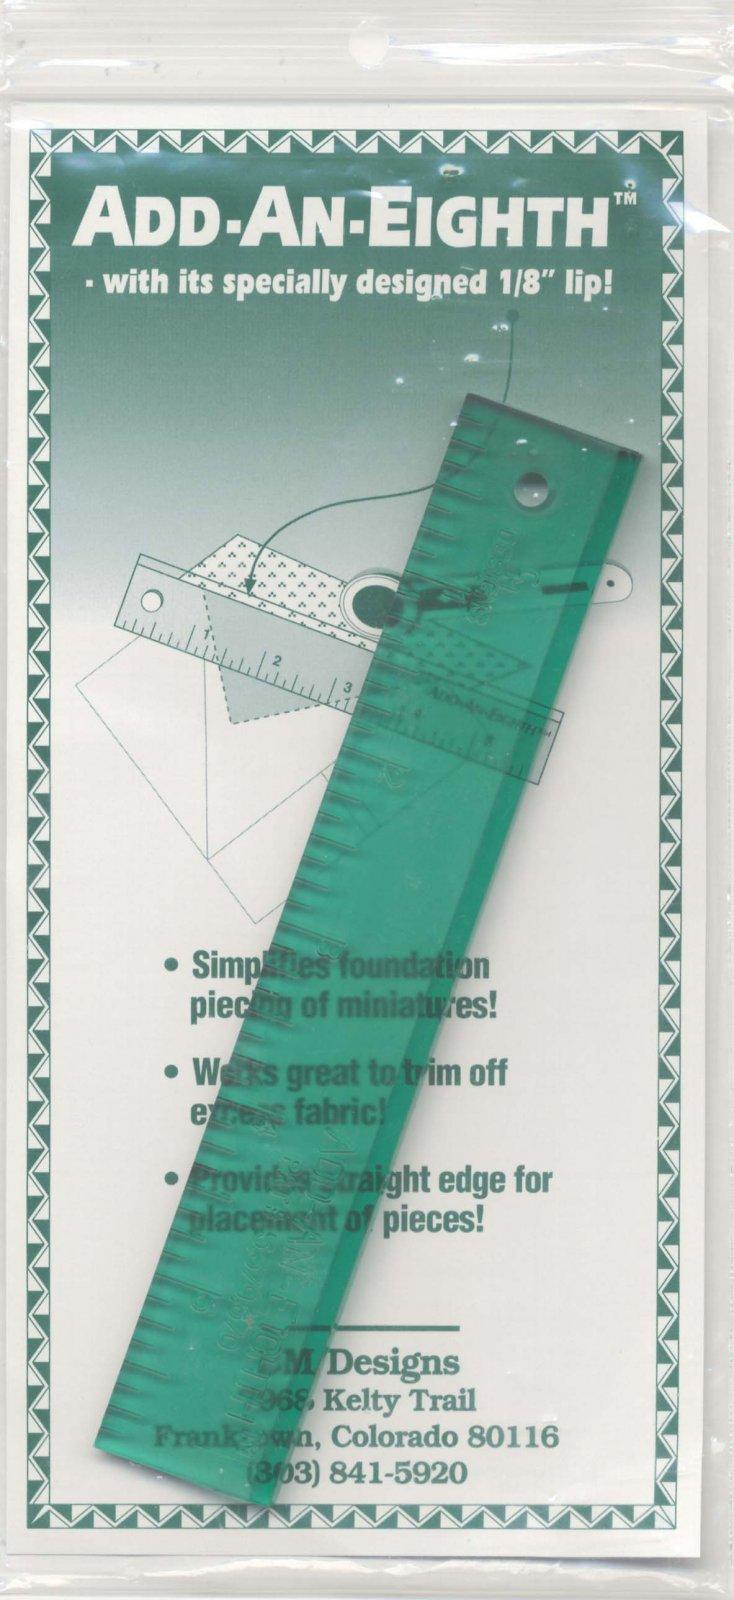 Add-An-Eighth (6 ruler)